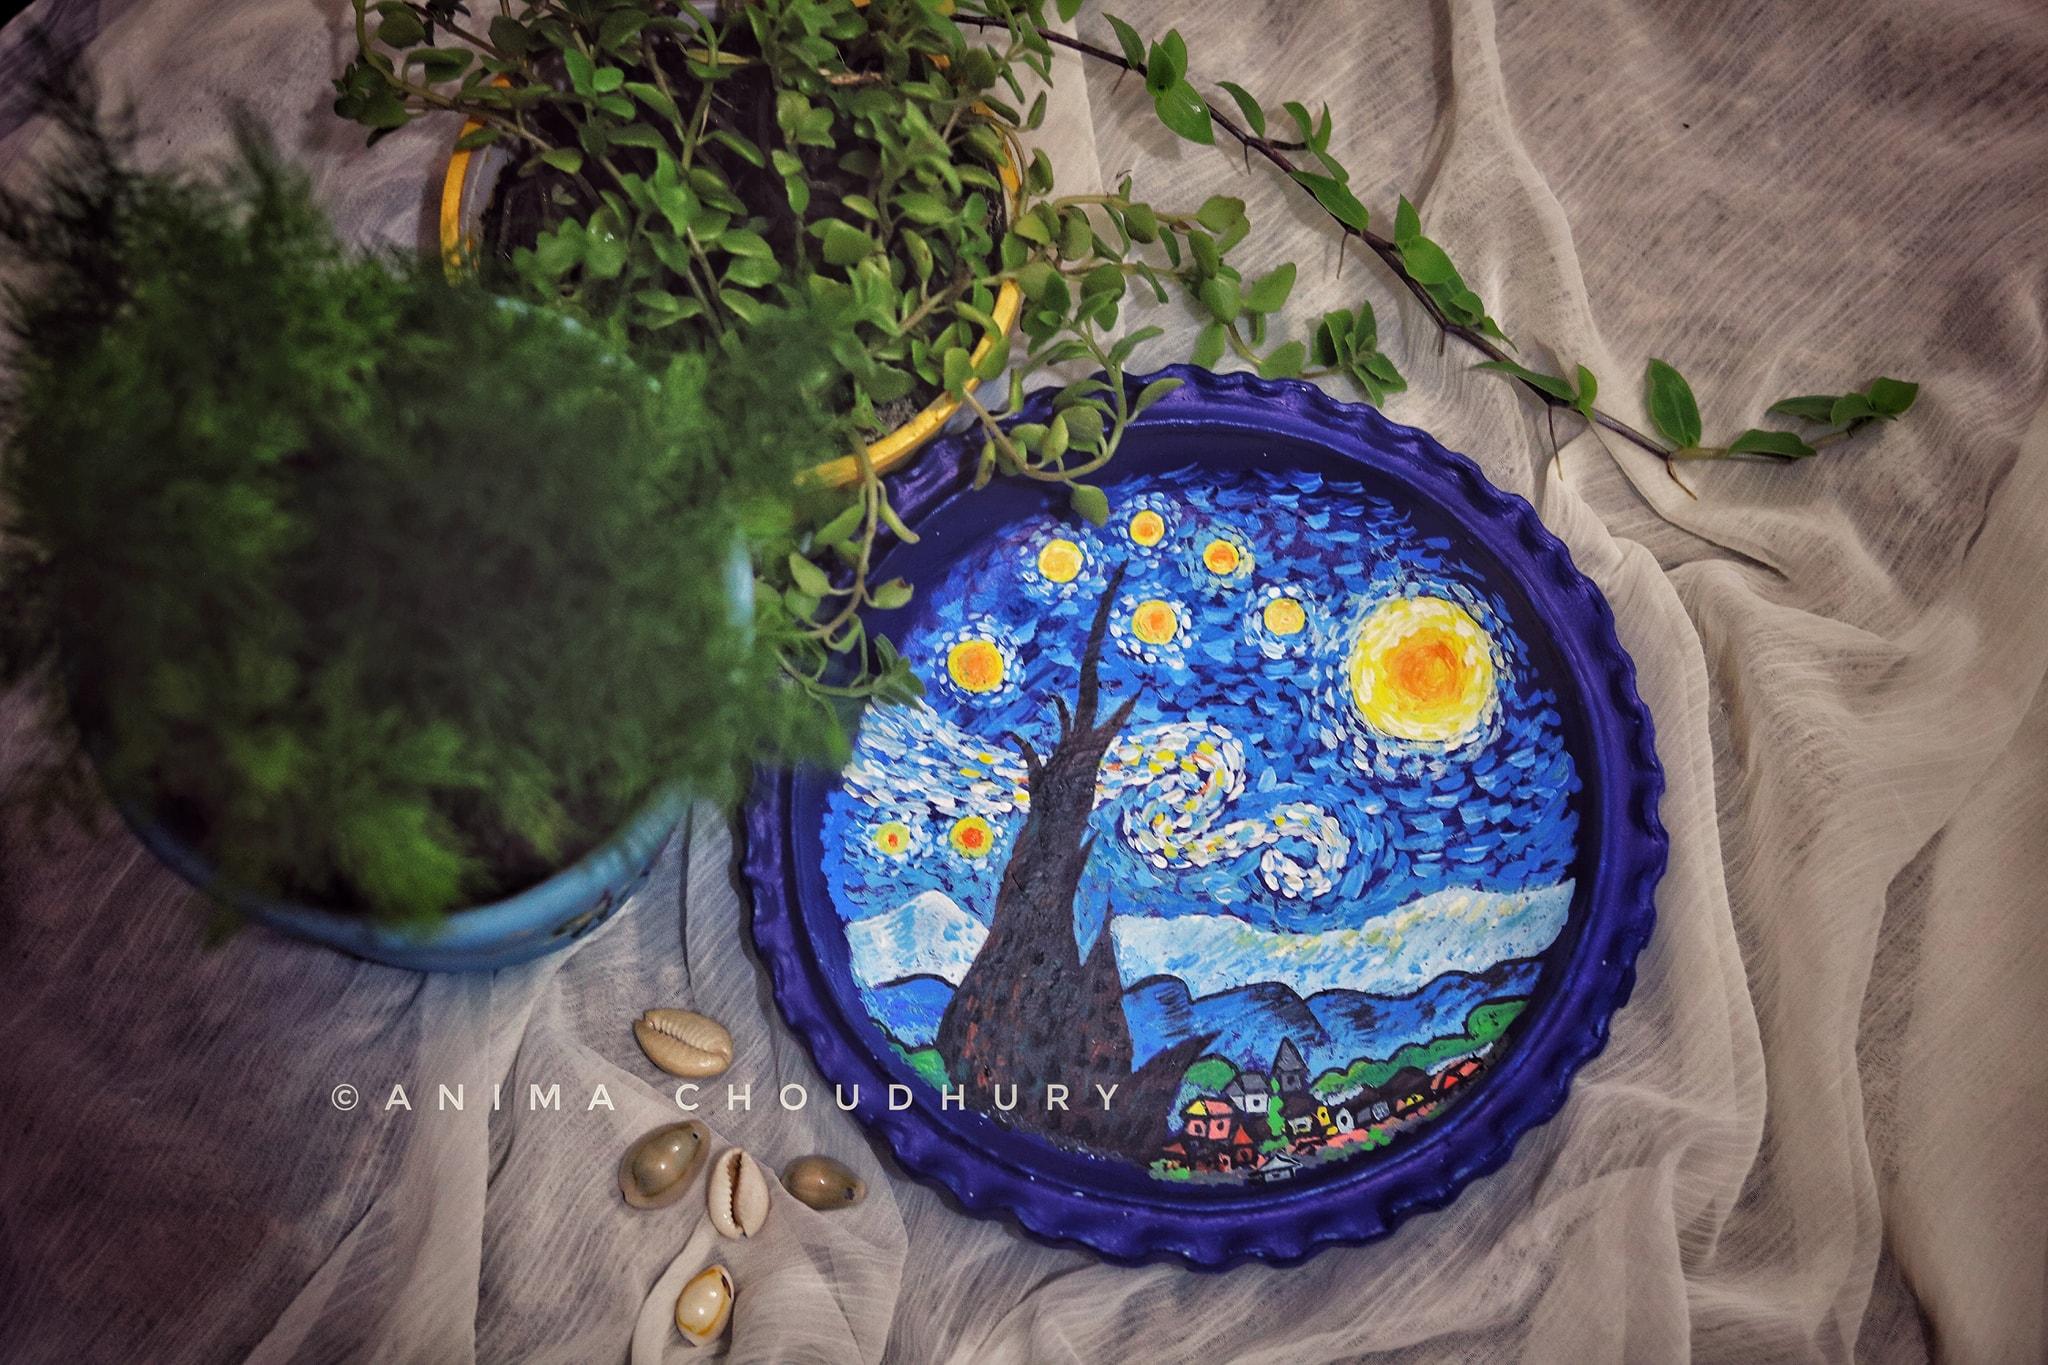 Anima Choudhury – Painting